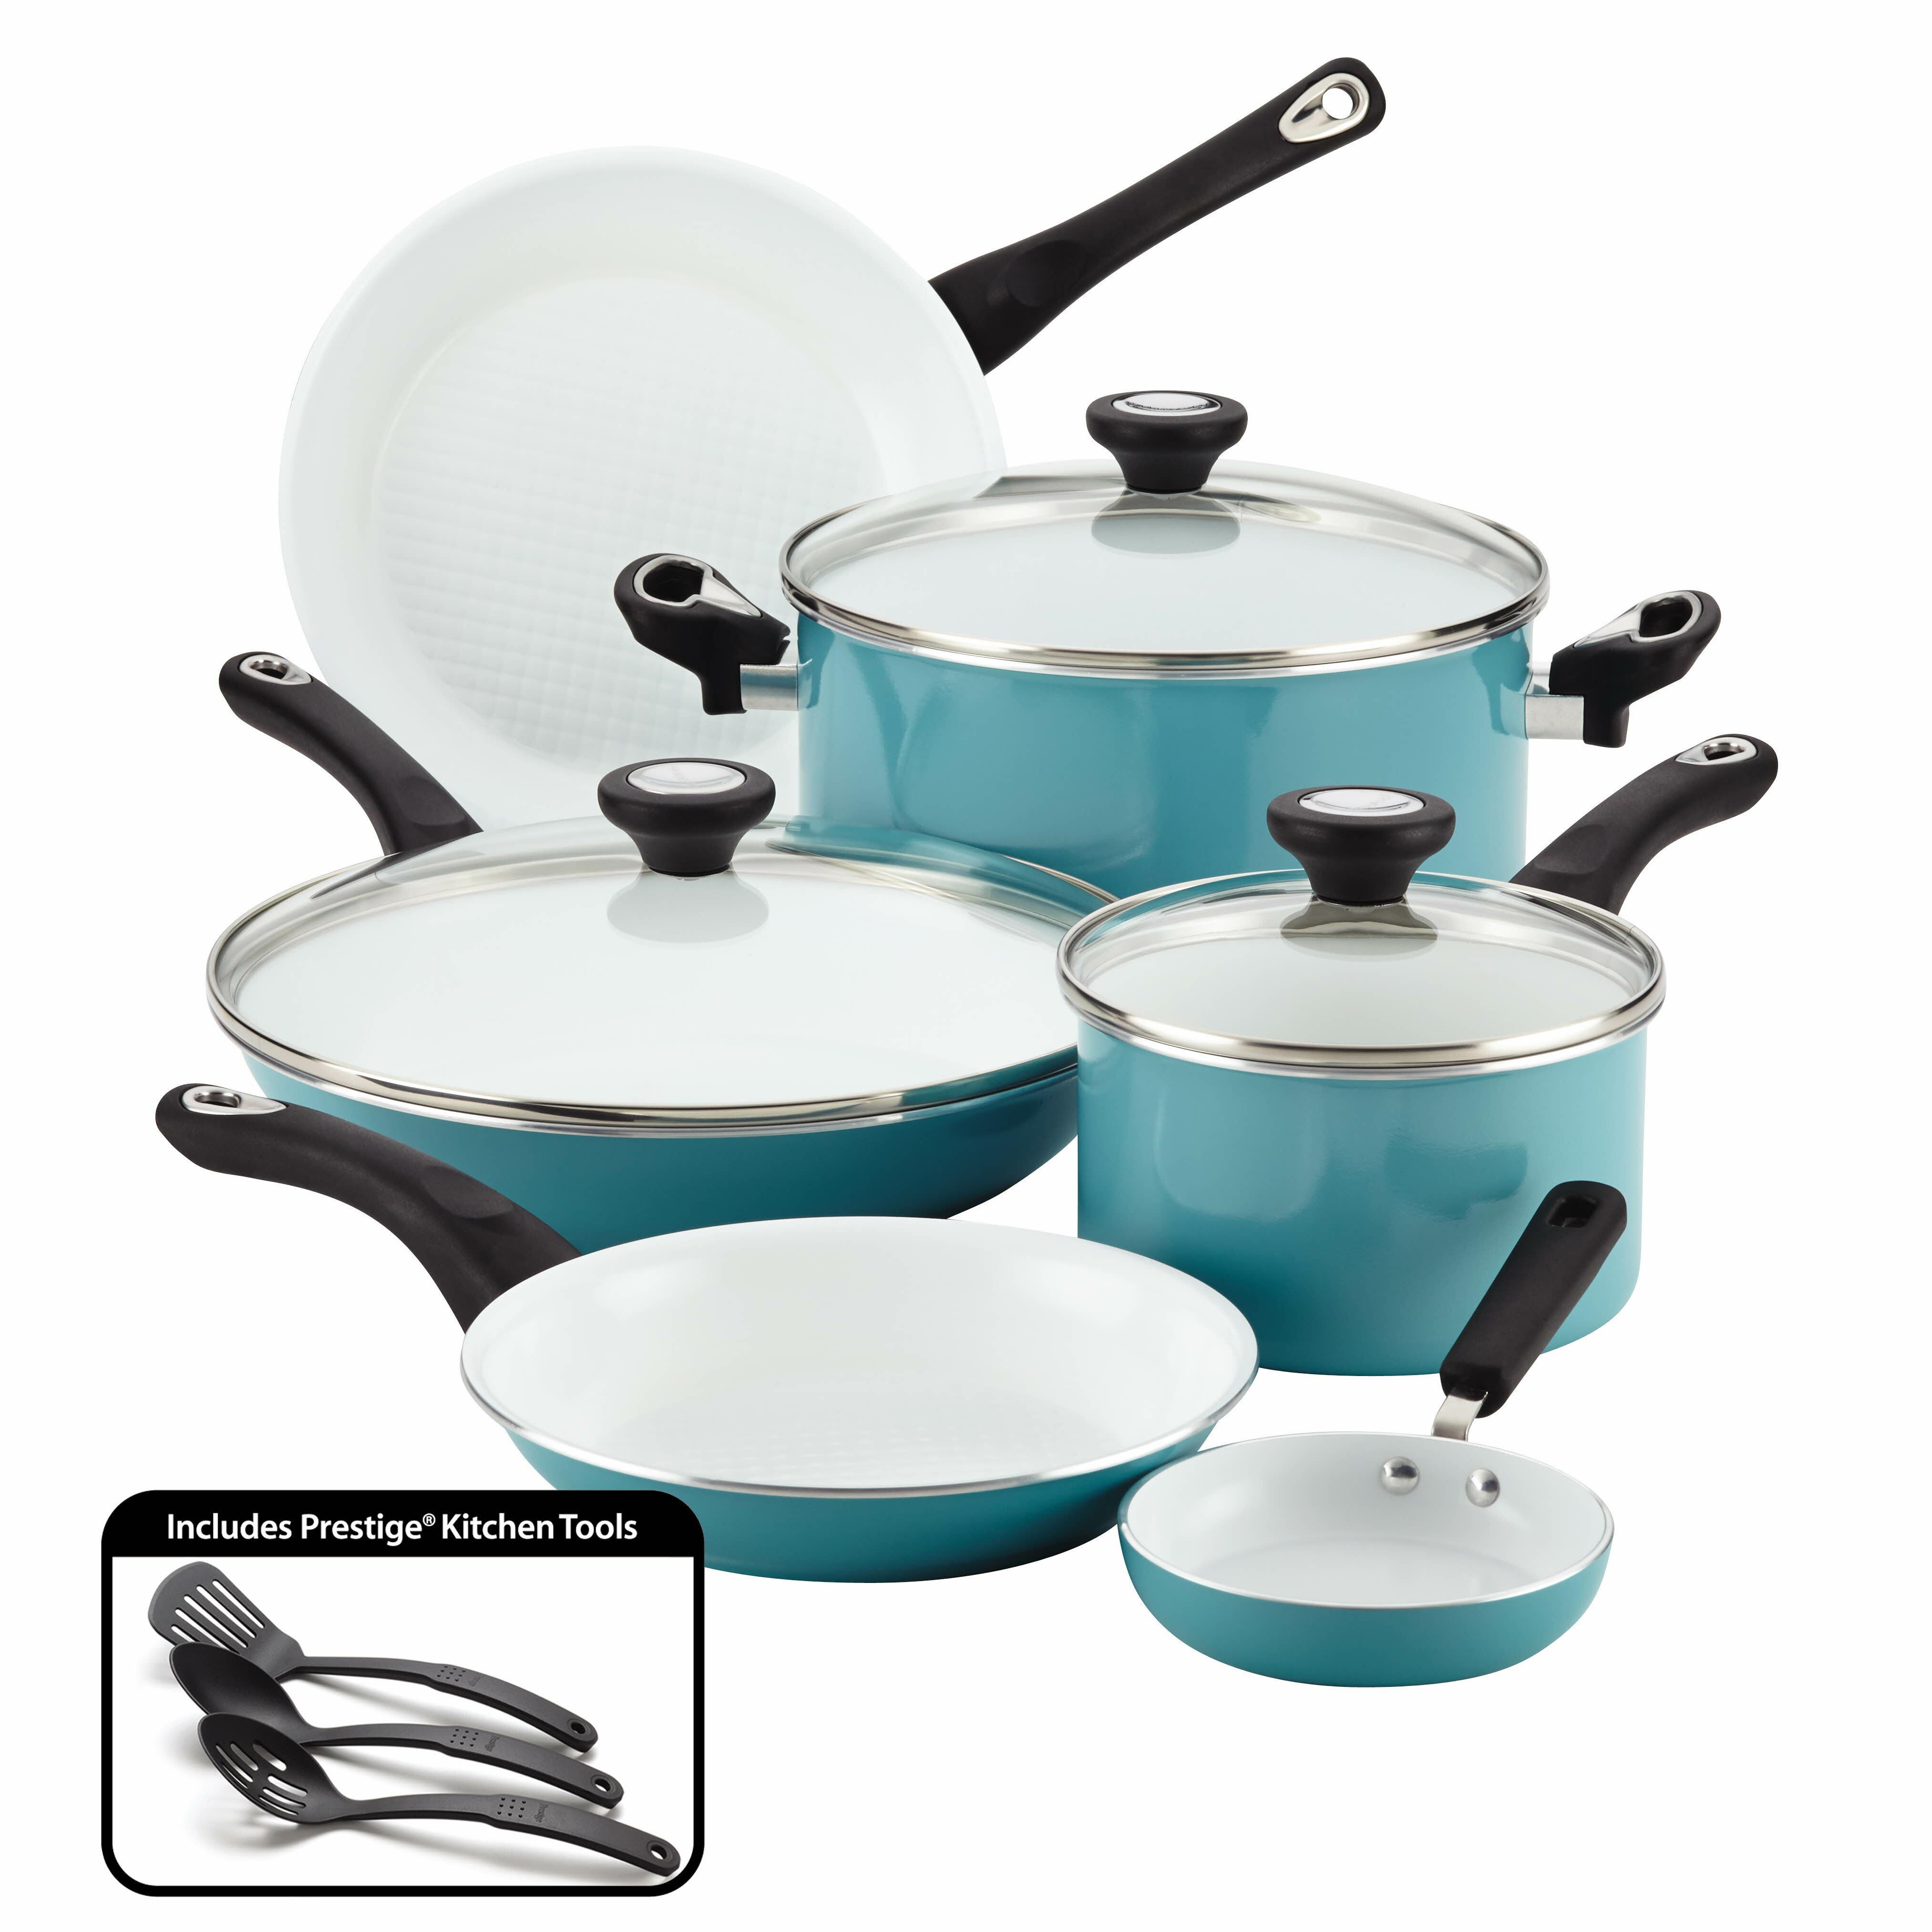 Farberware purecook 12 piece non stick cookware set reviews wayfair